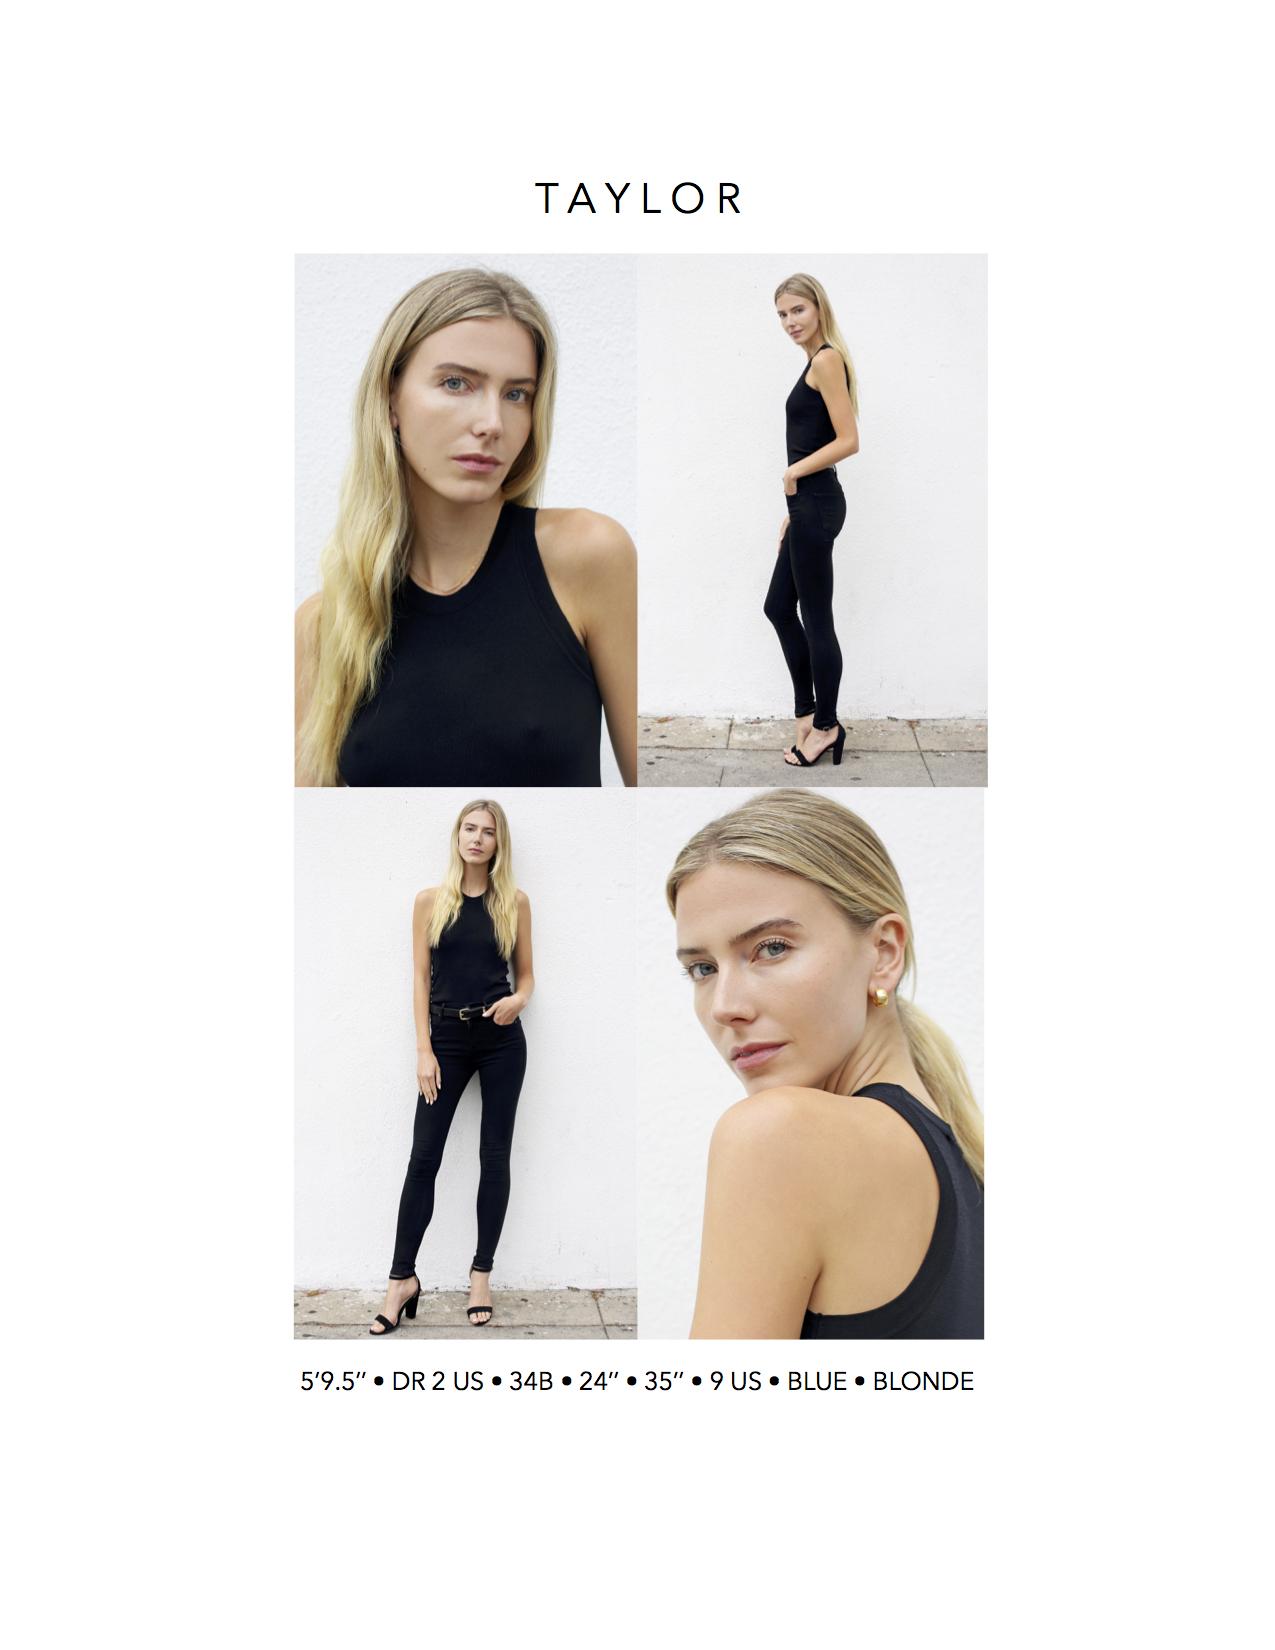 Taylor McKay Comp Card 6.jpg